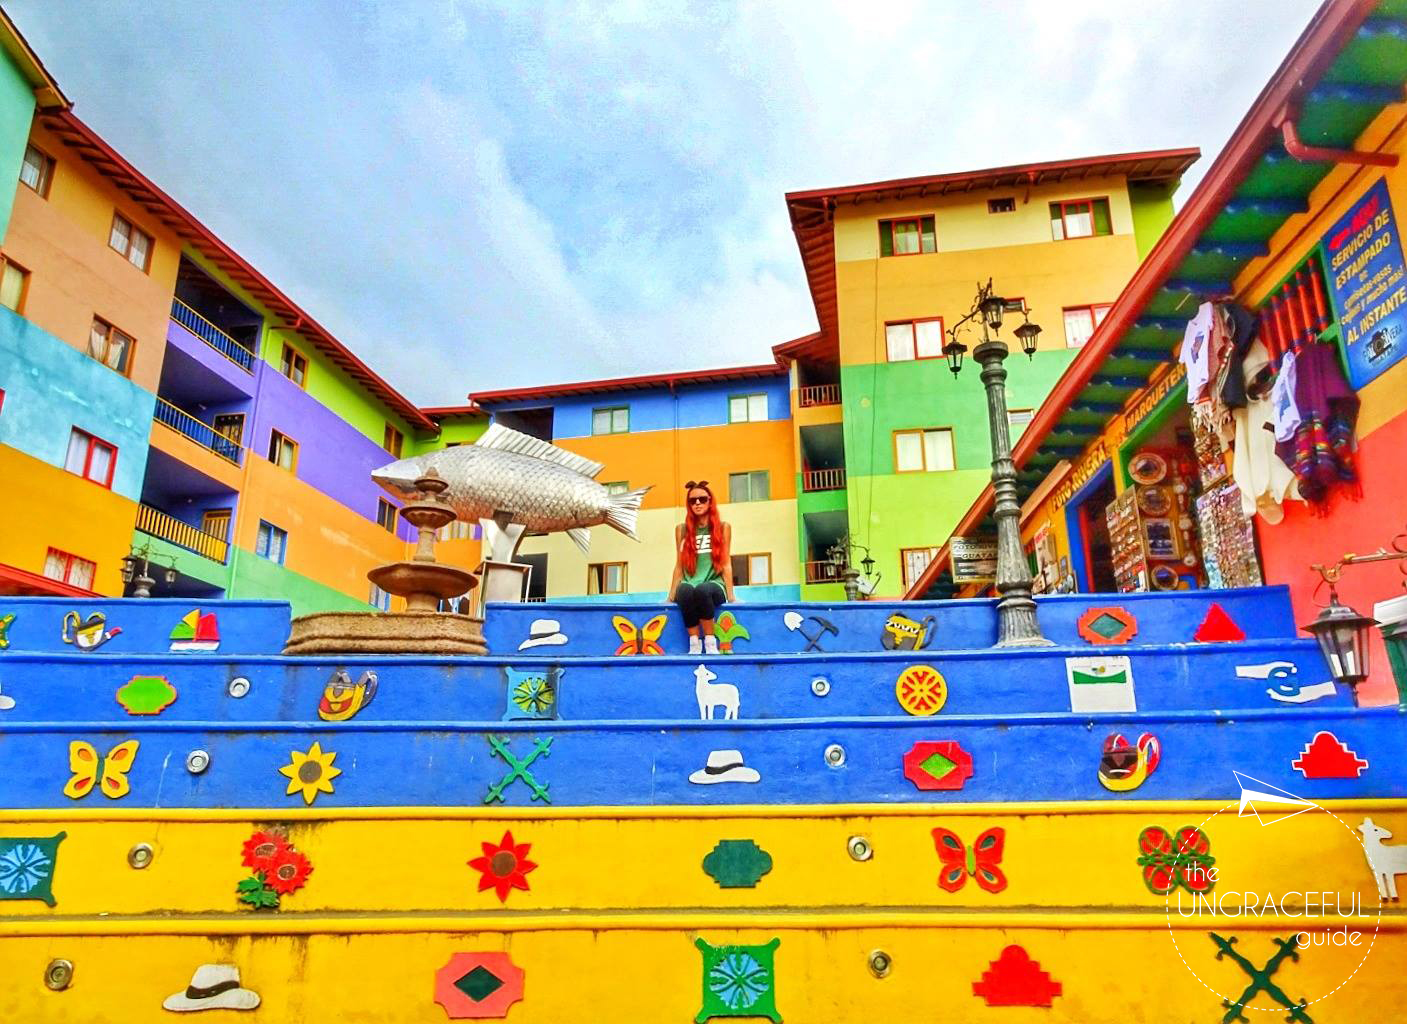 "Colombia: The Colourful Town of Guatapé <img src=""data:image/gif;base64,R0lGODdhAQABAPAAAP///wAAACwAAAAAAQABAEACAkQBADs="" data-lazy-src=""images/"" width=""800"" height=""600"" alt=""guatapé - guata - Colombia: The Colourful Town of Guatapé"">"